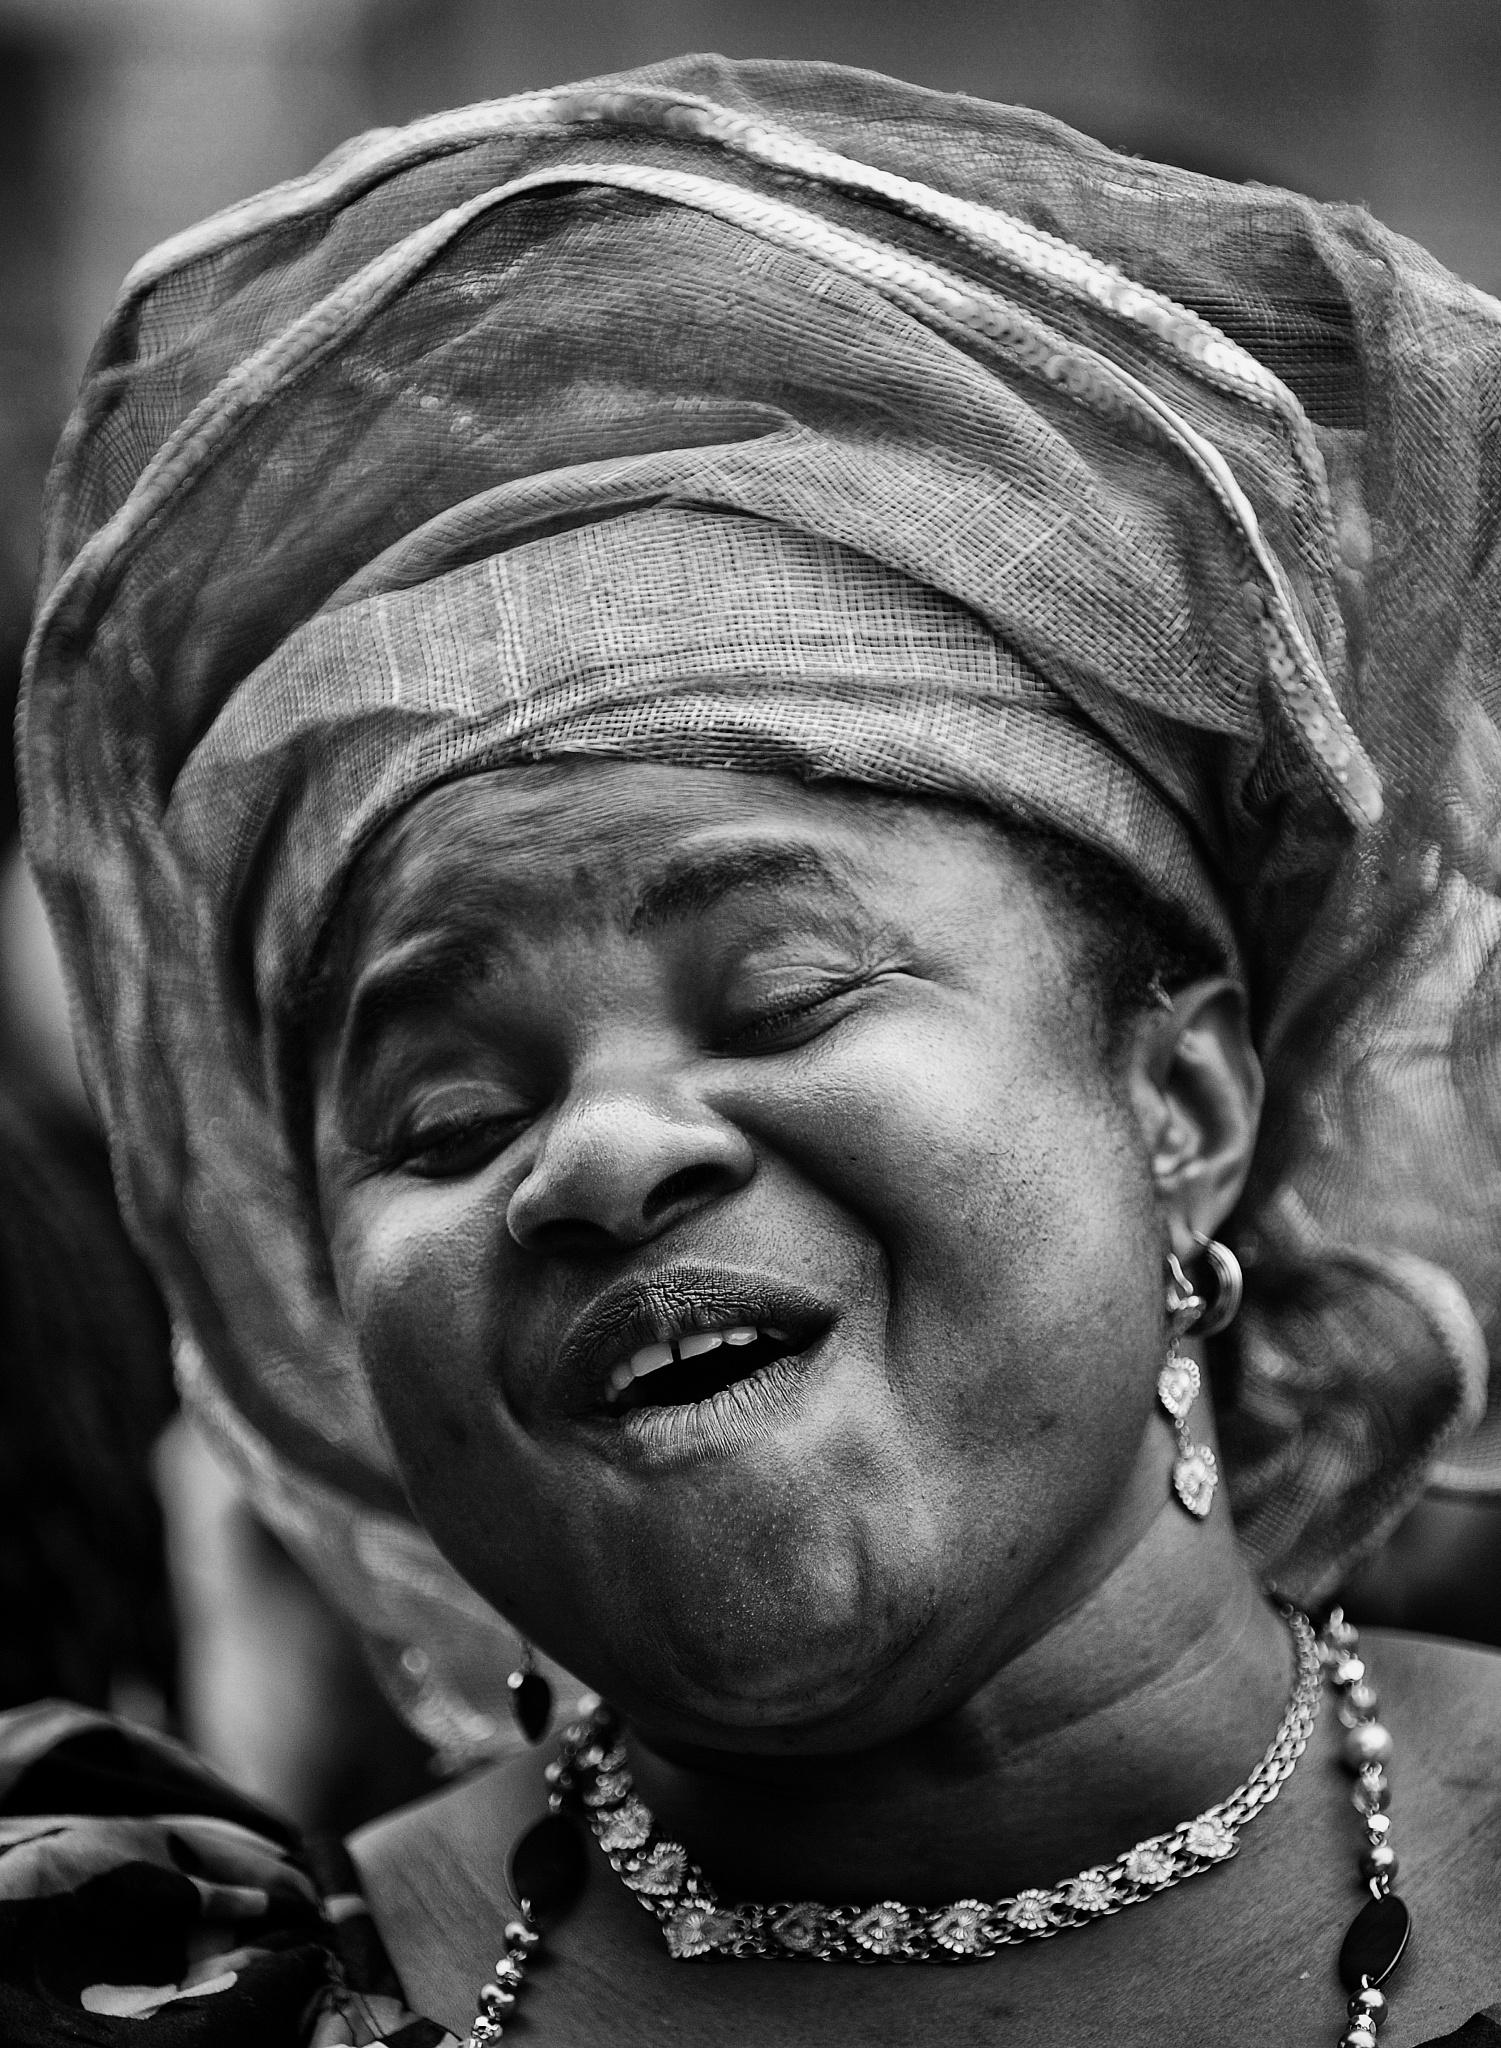 Africa Day, Dublin by desmcmahon5